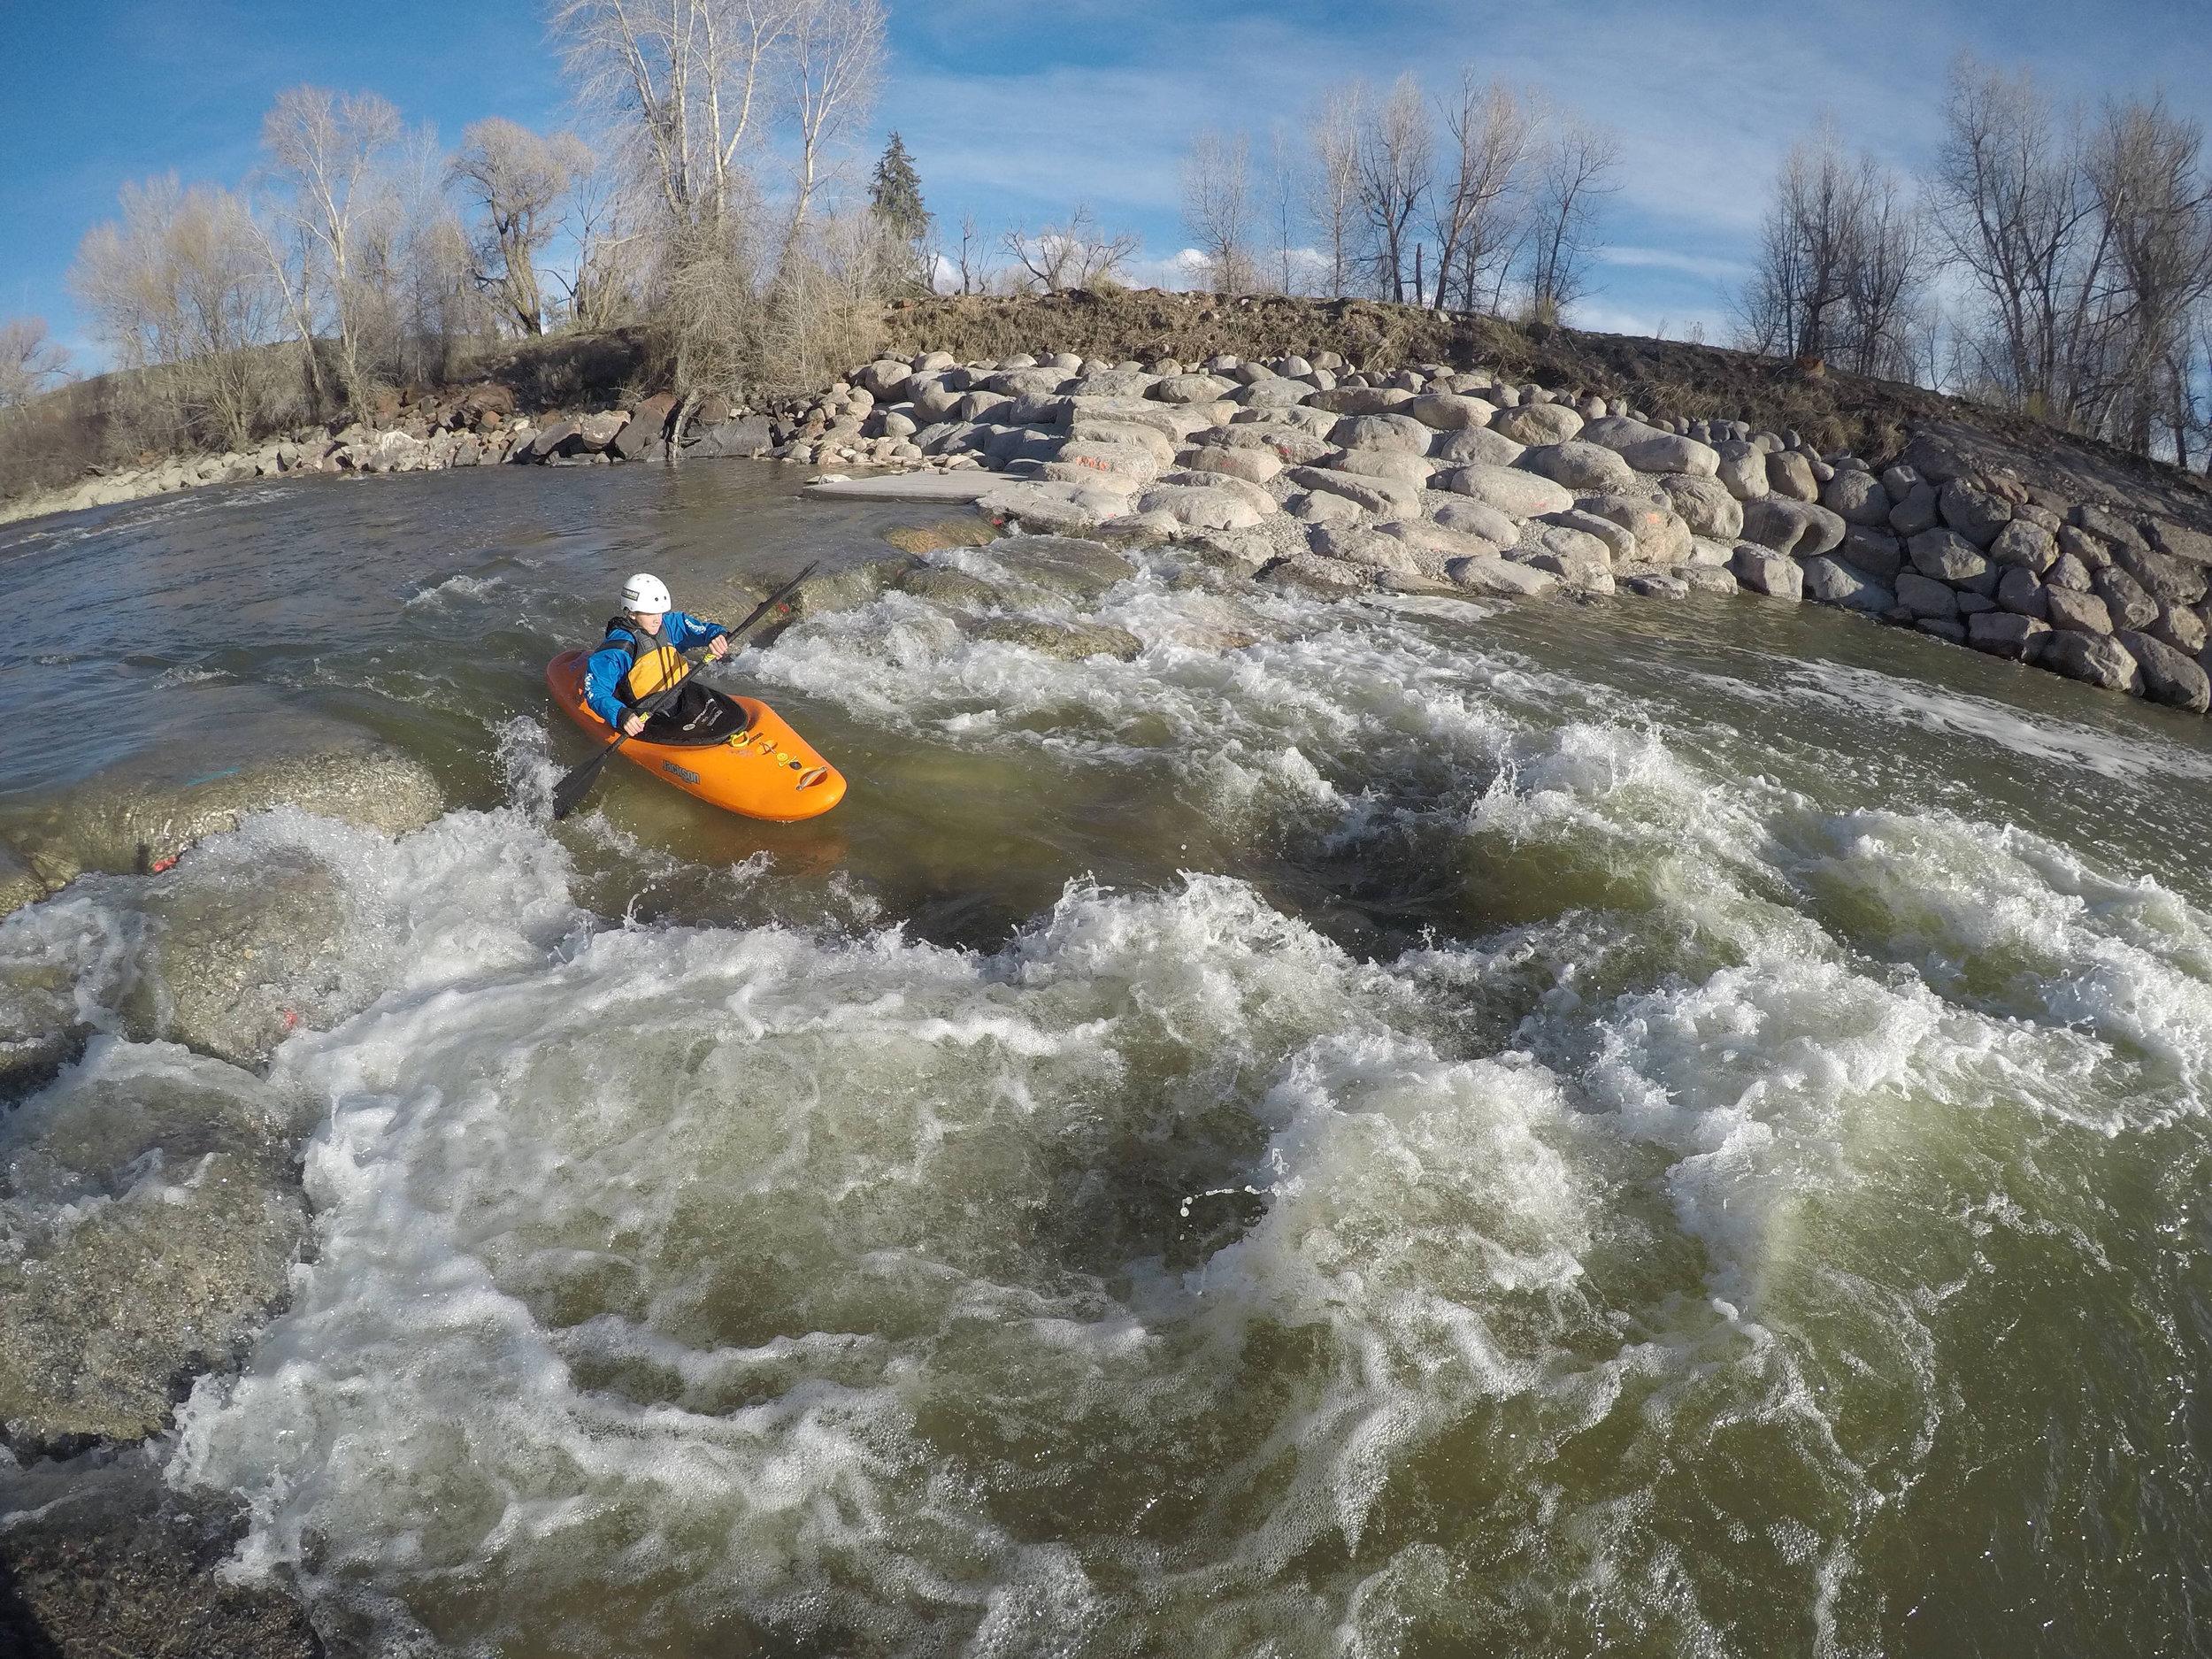 A kayaker on the Eagle River Whitewater Park. | Ken Hoeve